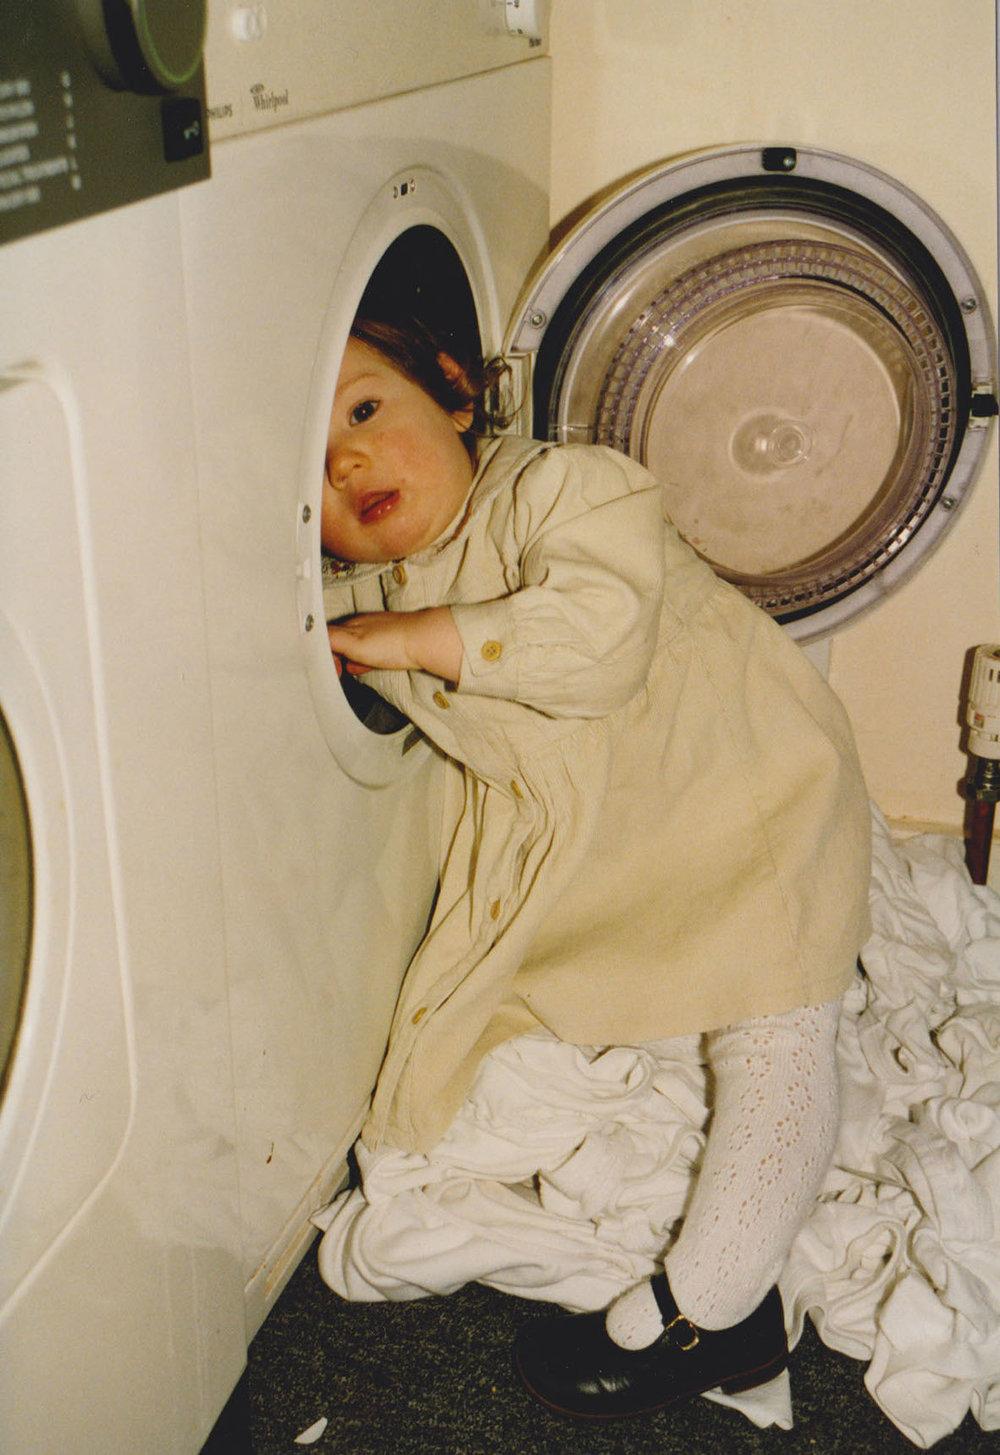 Me washing machine 2.jpg